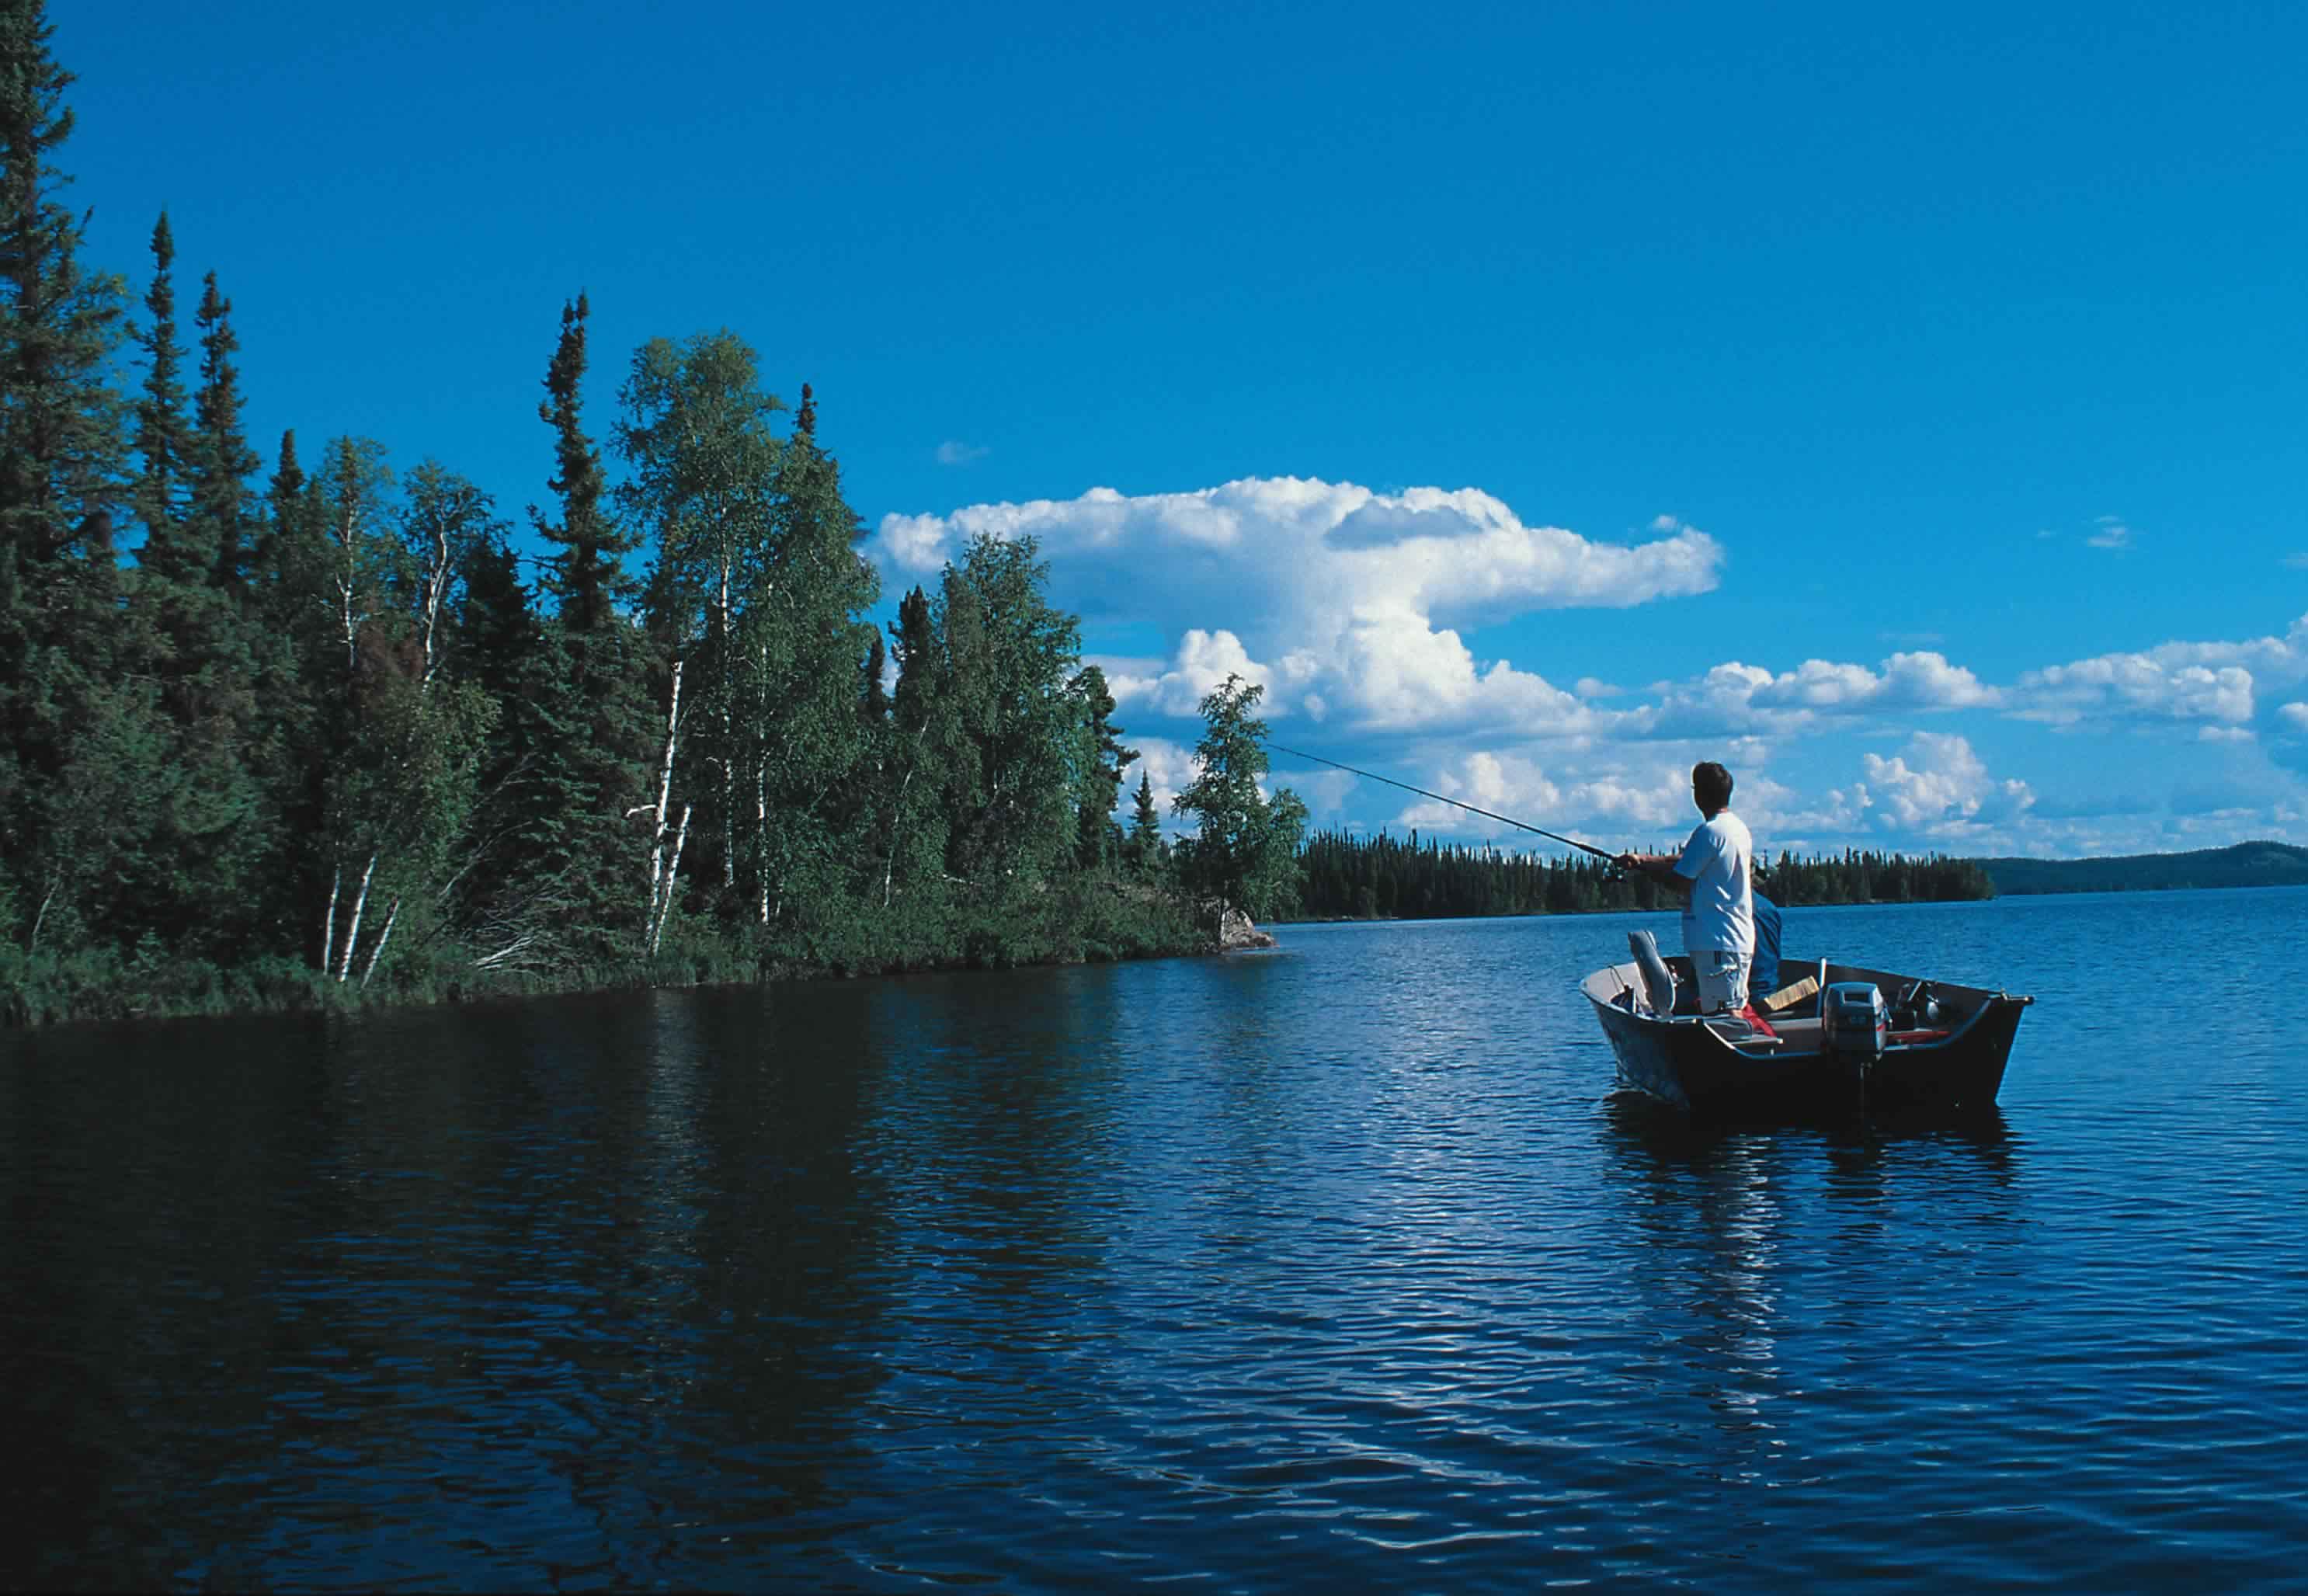 Ribolov na fotkama Fishing_scenic